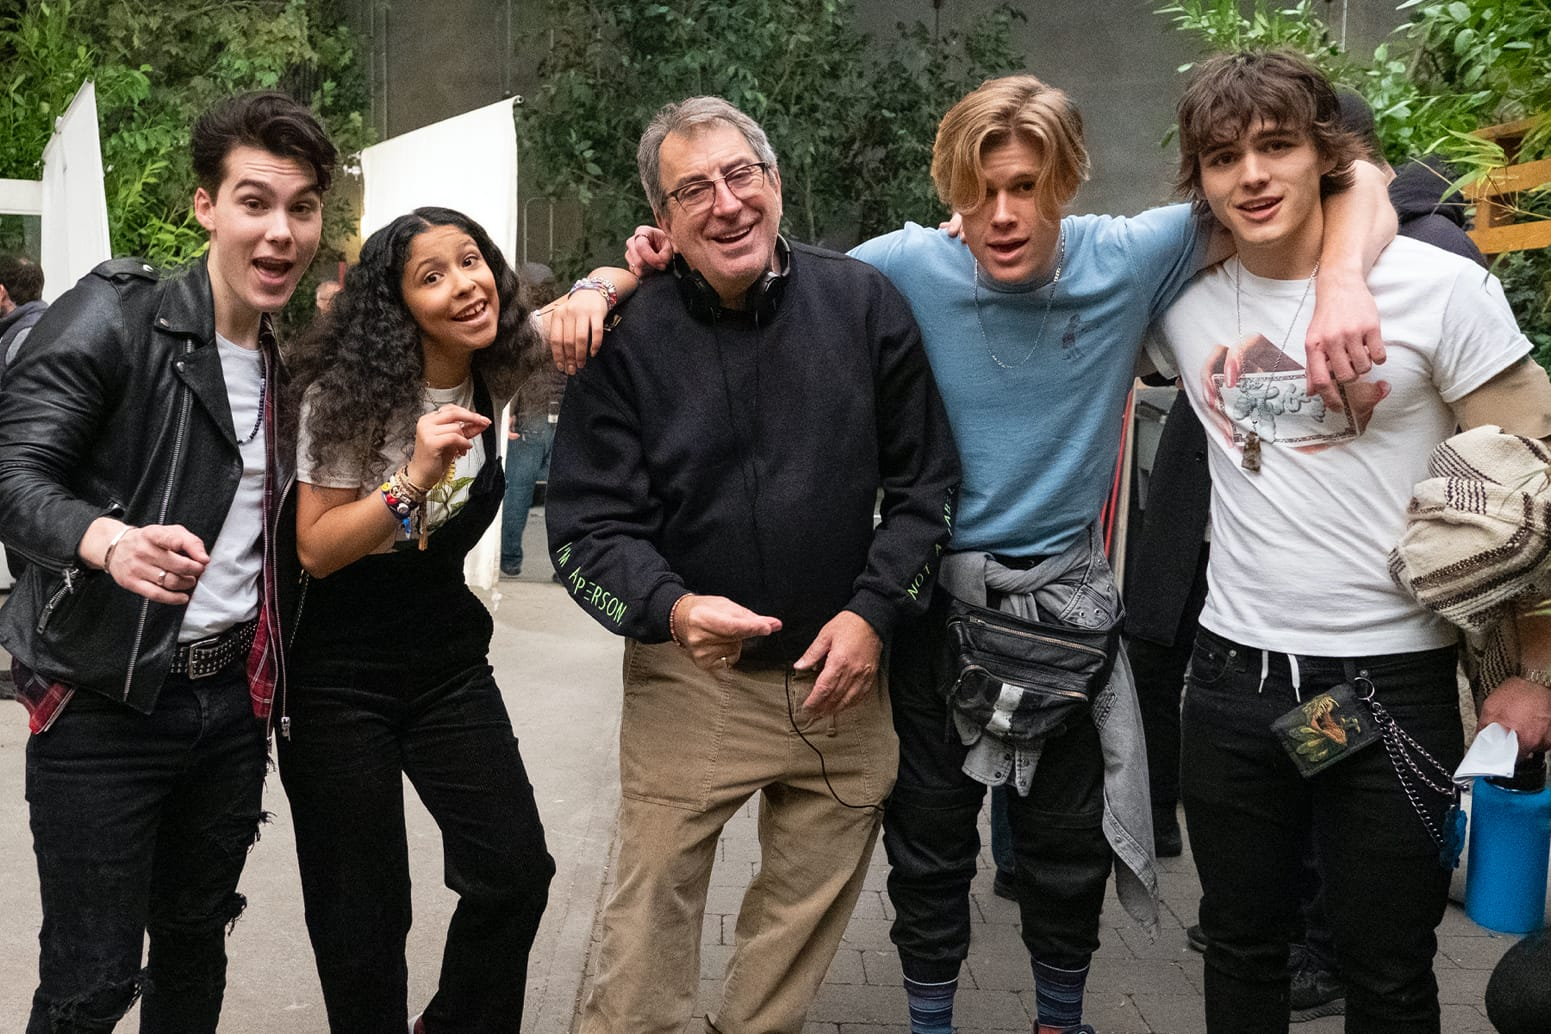 Kenny Ortega with *Julie and the Phantoms* cast members Jeremy Shada, Madison Reyes, Owen Patrick Joyner, and Charlie Gillespie